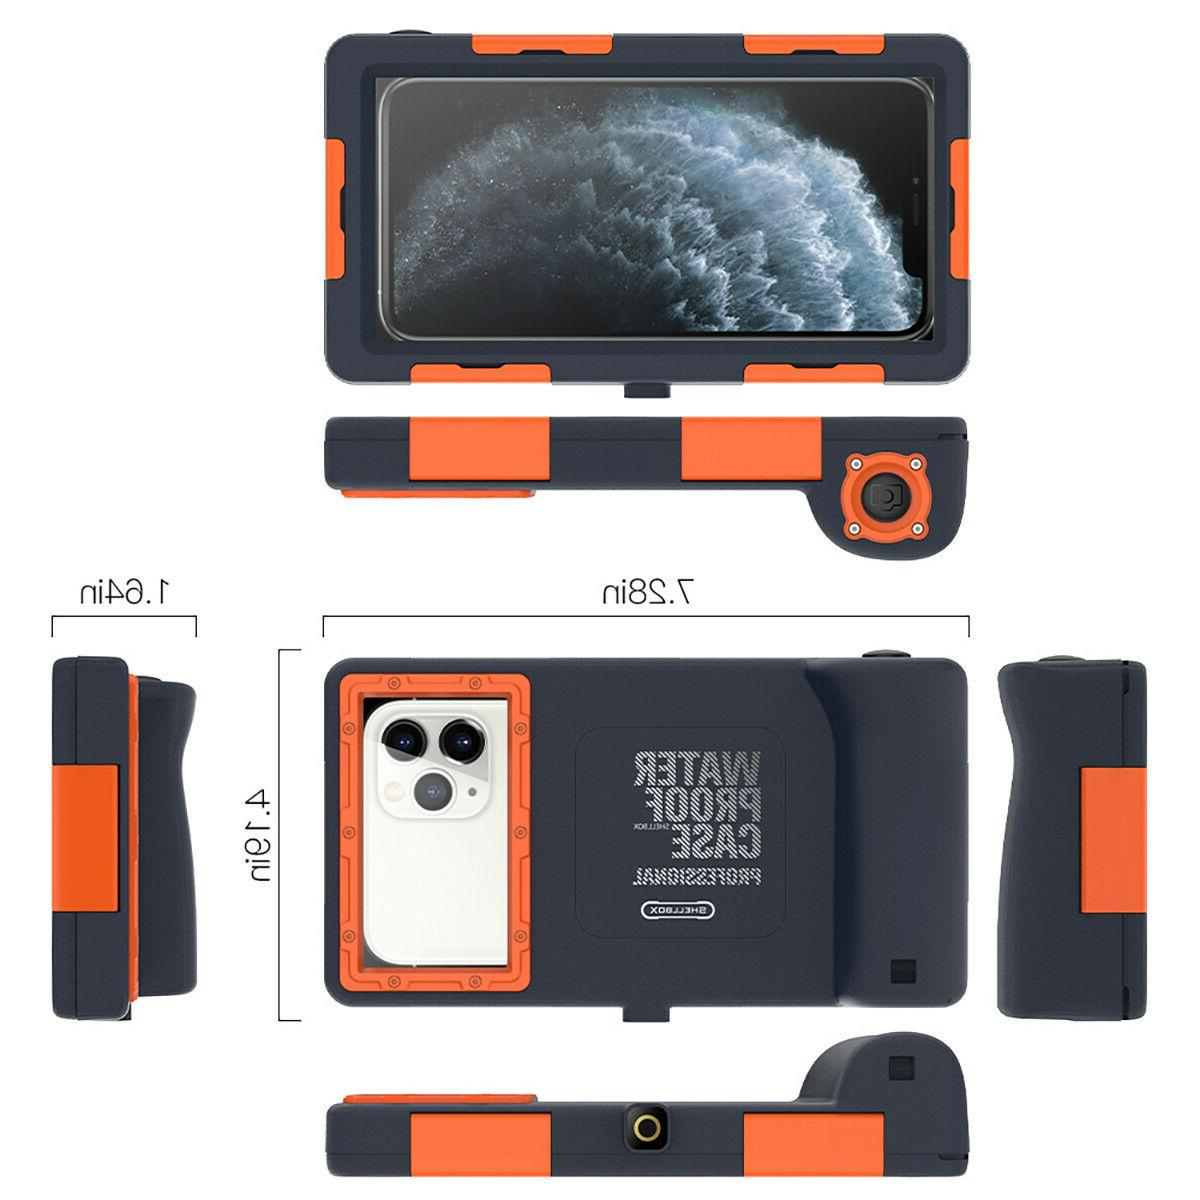 Underwater Diving Camera iPhone 11 Max